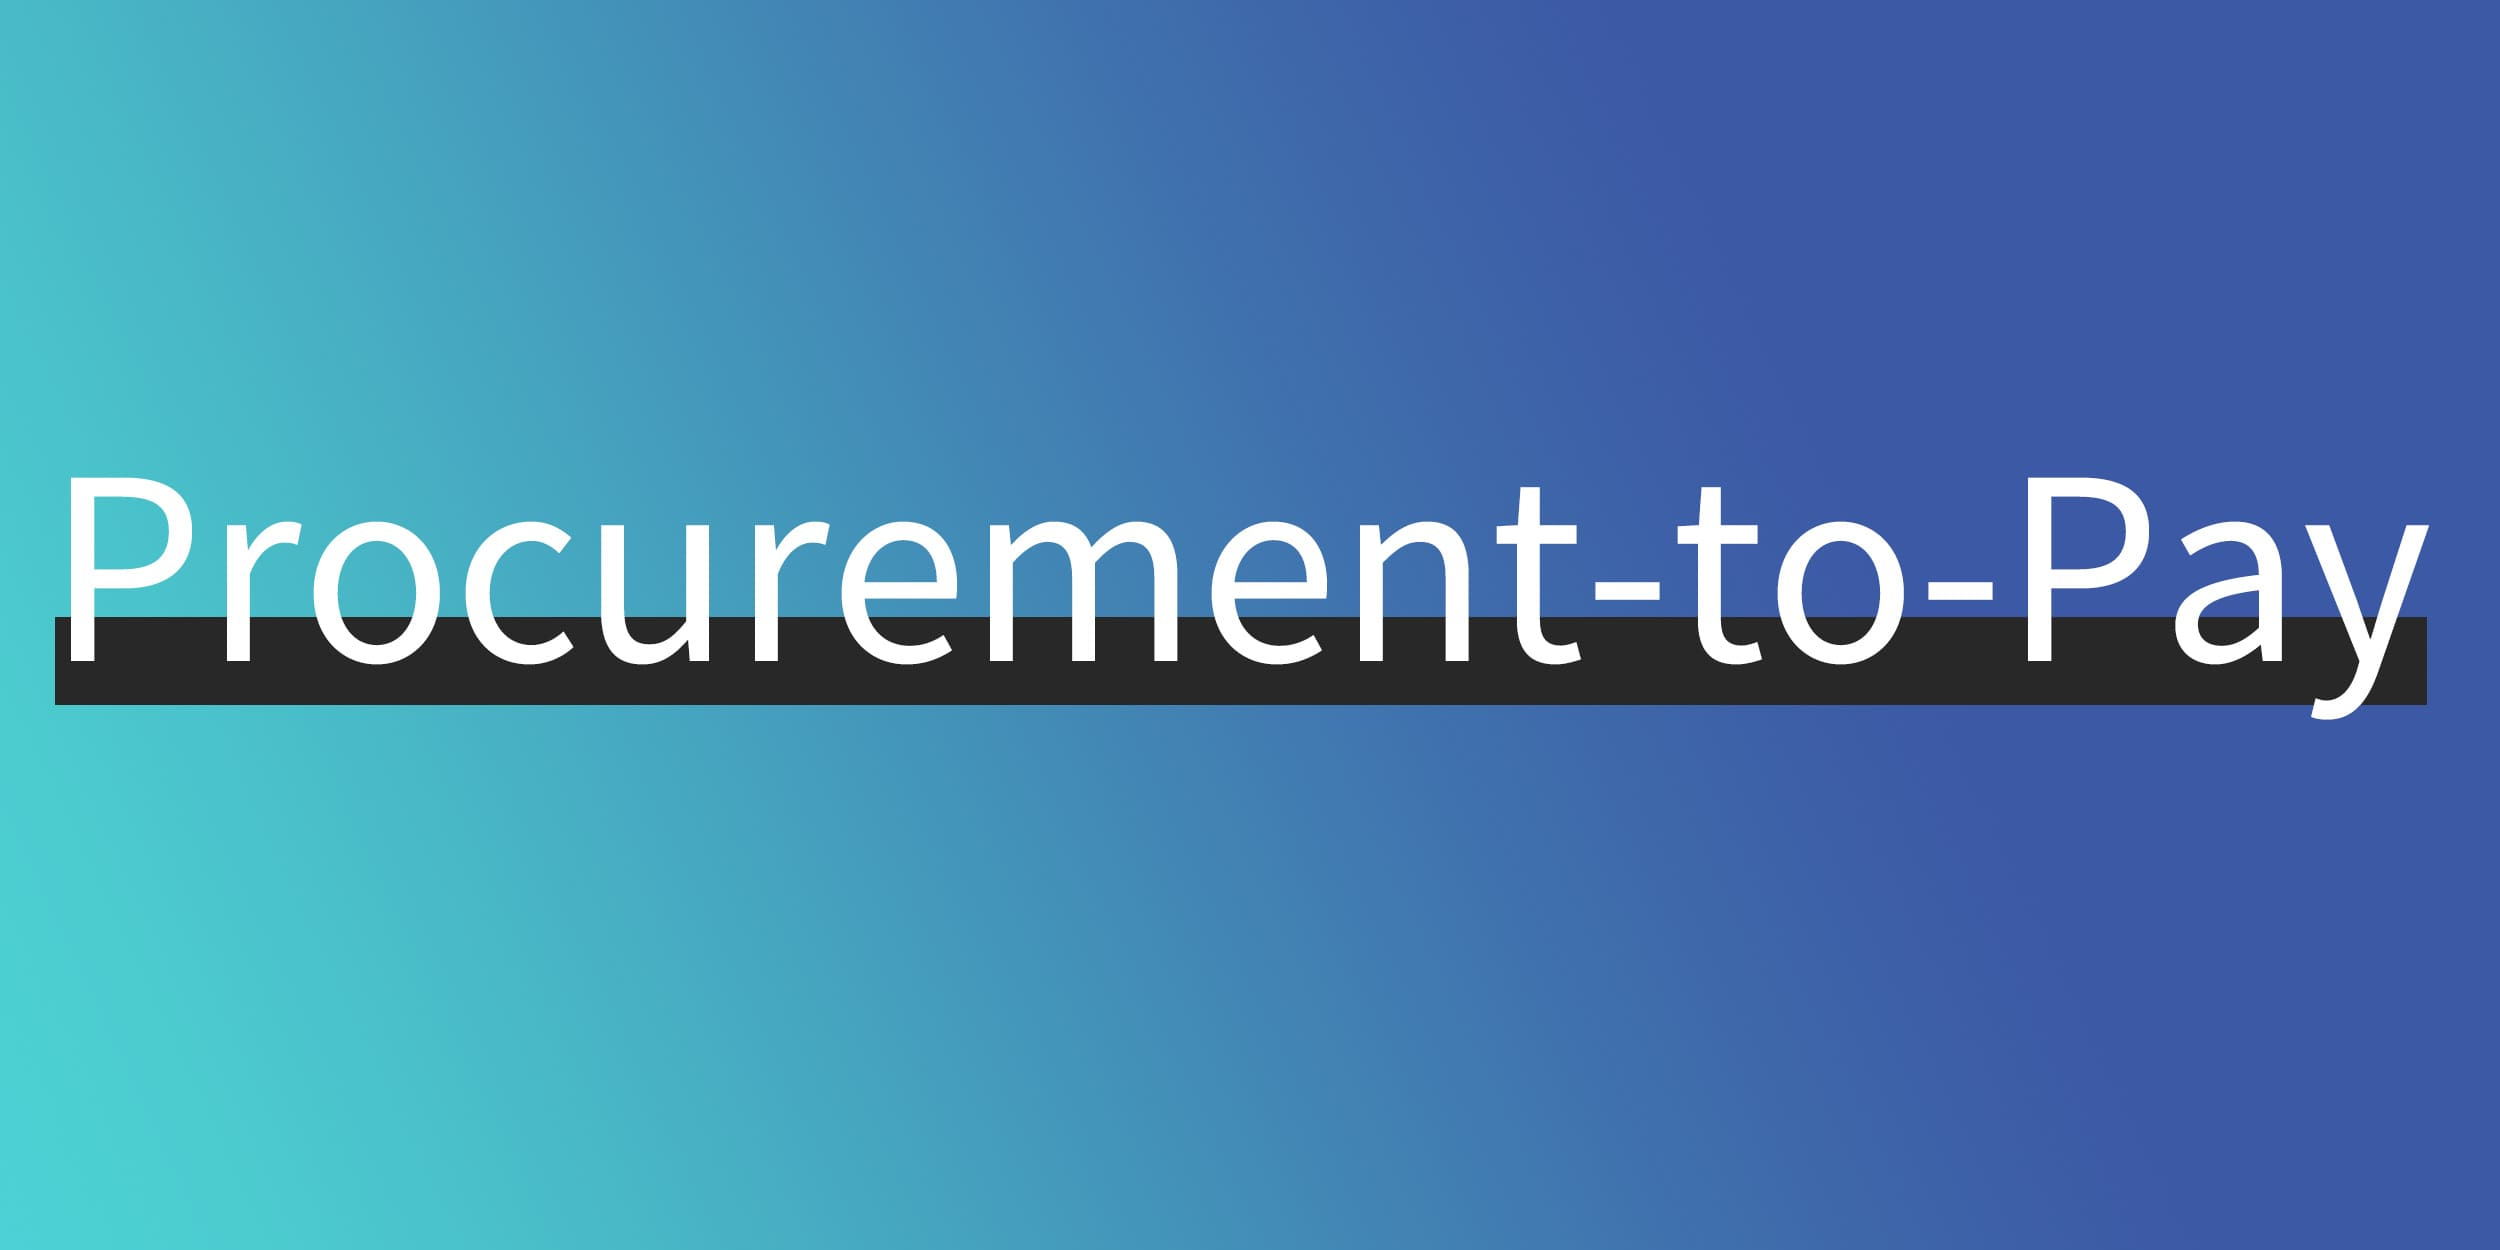 """Procurement-to-Pay""とは?意味やビジネスとの関係、調達をスムーズにする購買プロセスを徹底解説"